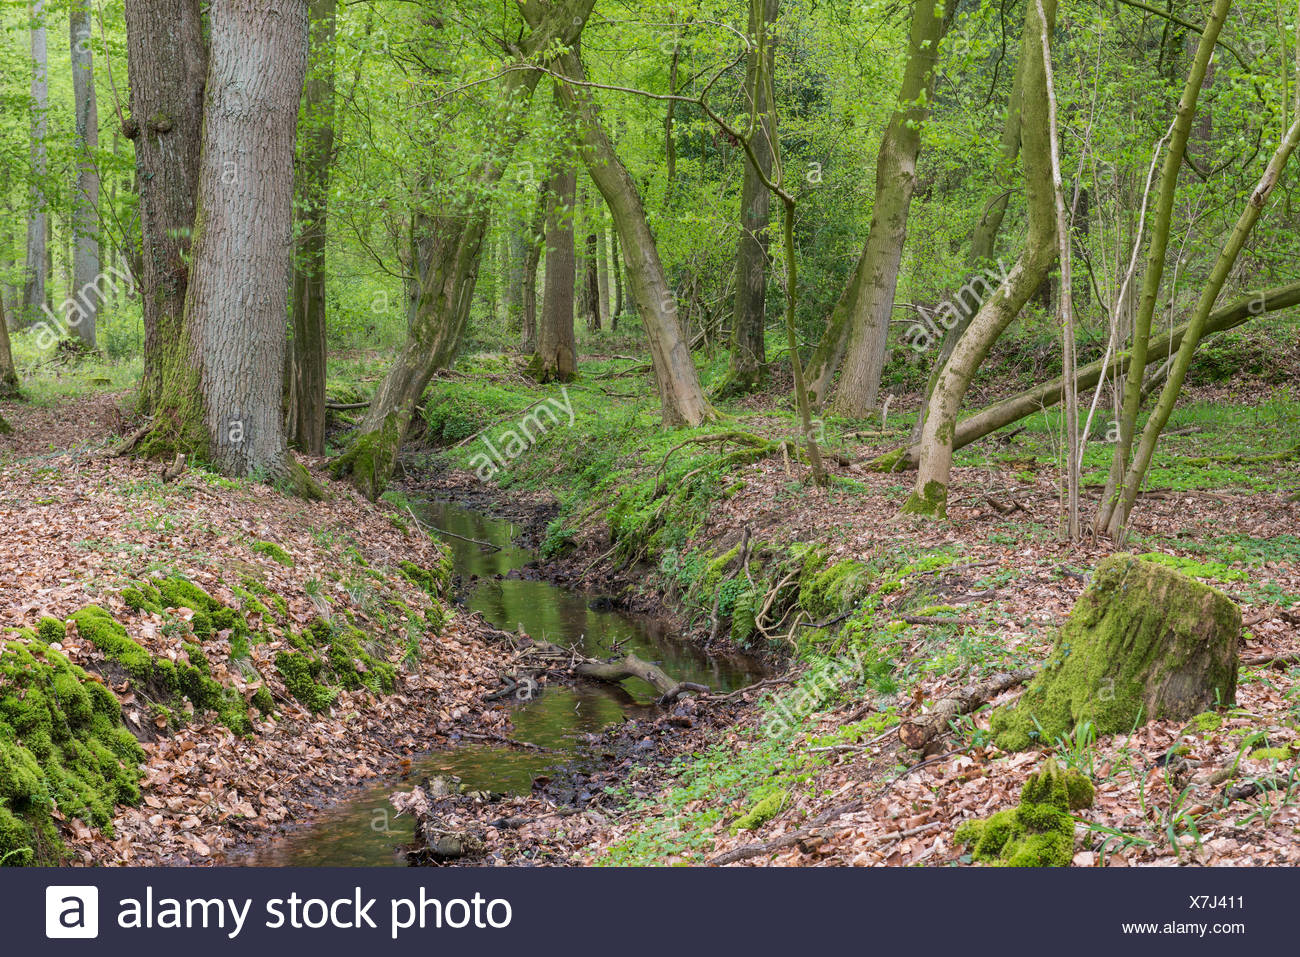 stream at herrenholz, lutten, goldenstedt, vechta district, oldenburger münsterland, lower saxony, germany Stock Photo